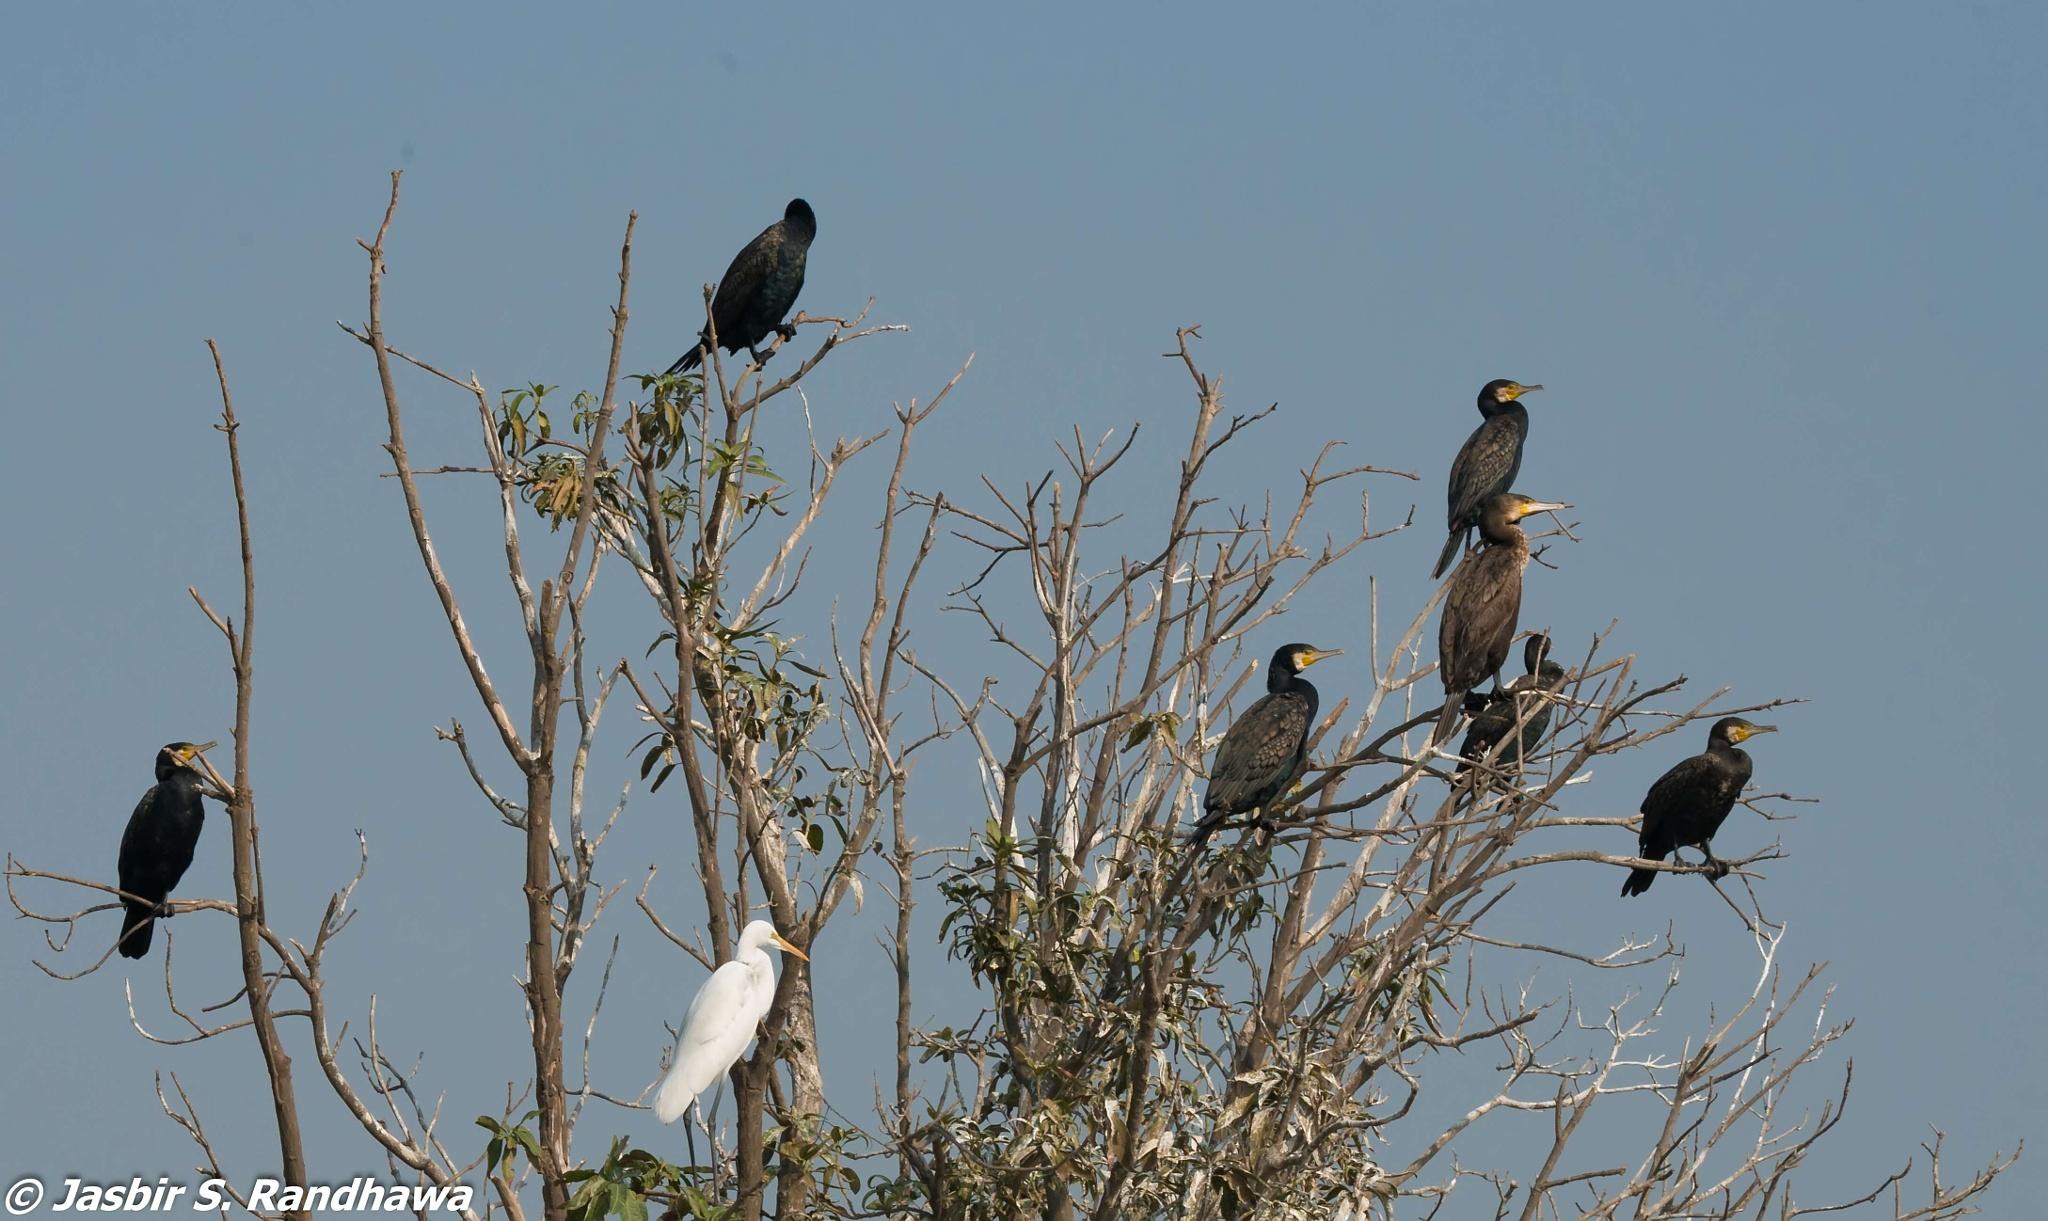 Great Cormorants (Phalacrocorax carbo)  and a Great Egret (Ardea alba) by Jasbir S. Randhawa